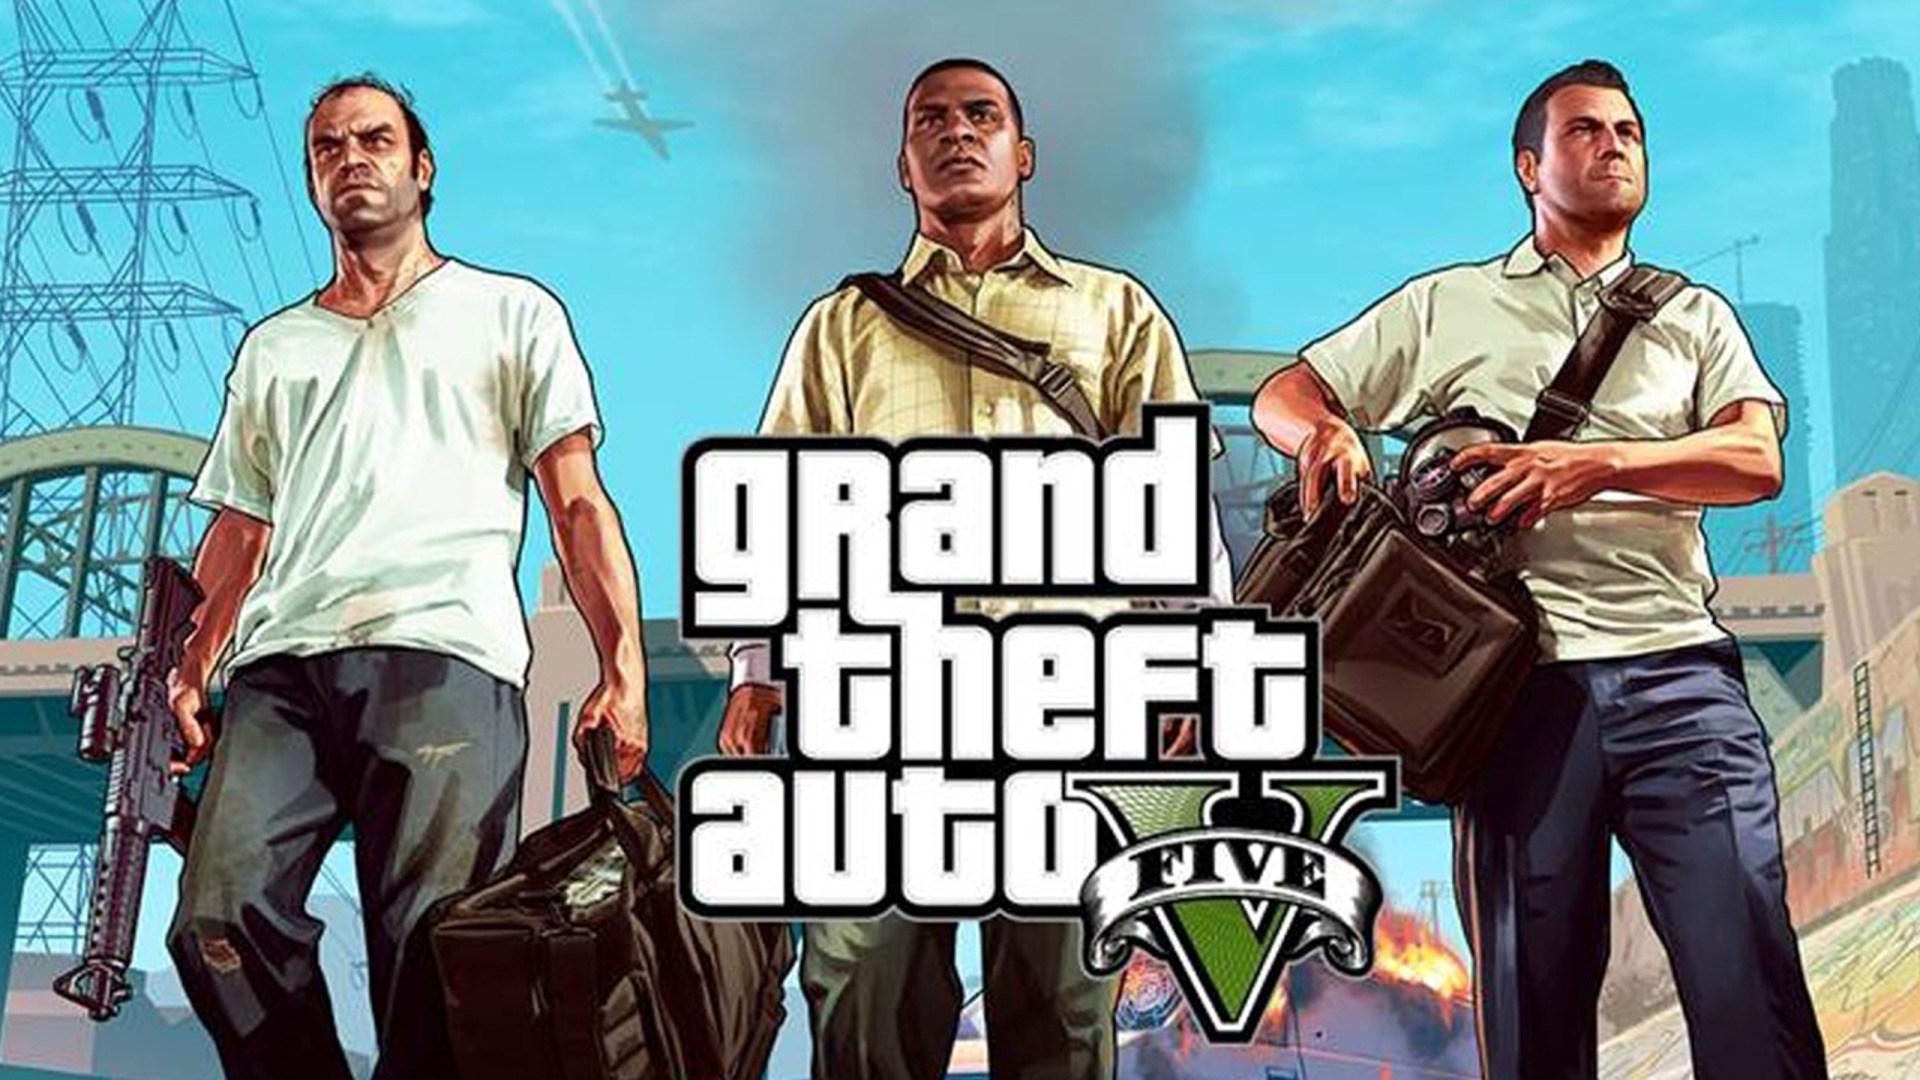 Rockstar Games, GTA 5, Grand Theft Auto 5, Gta V, Take Two